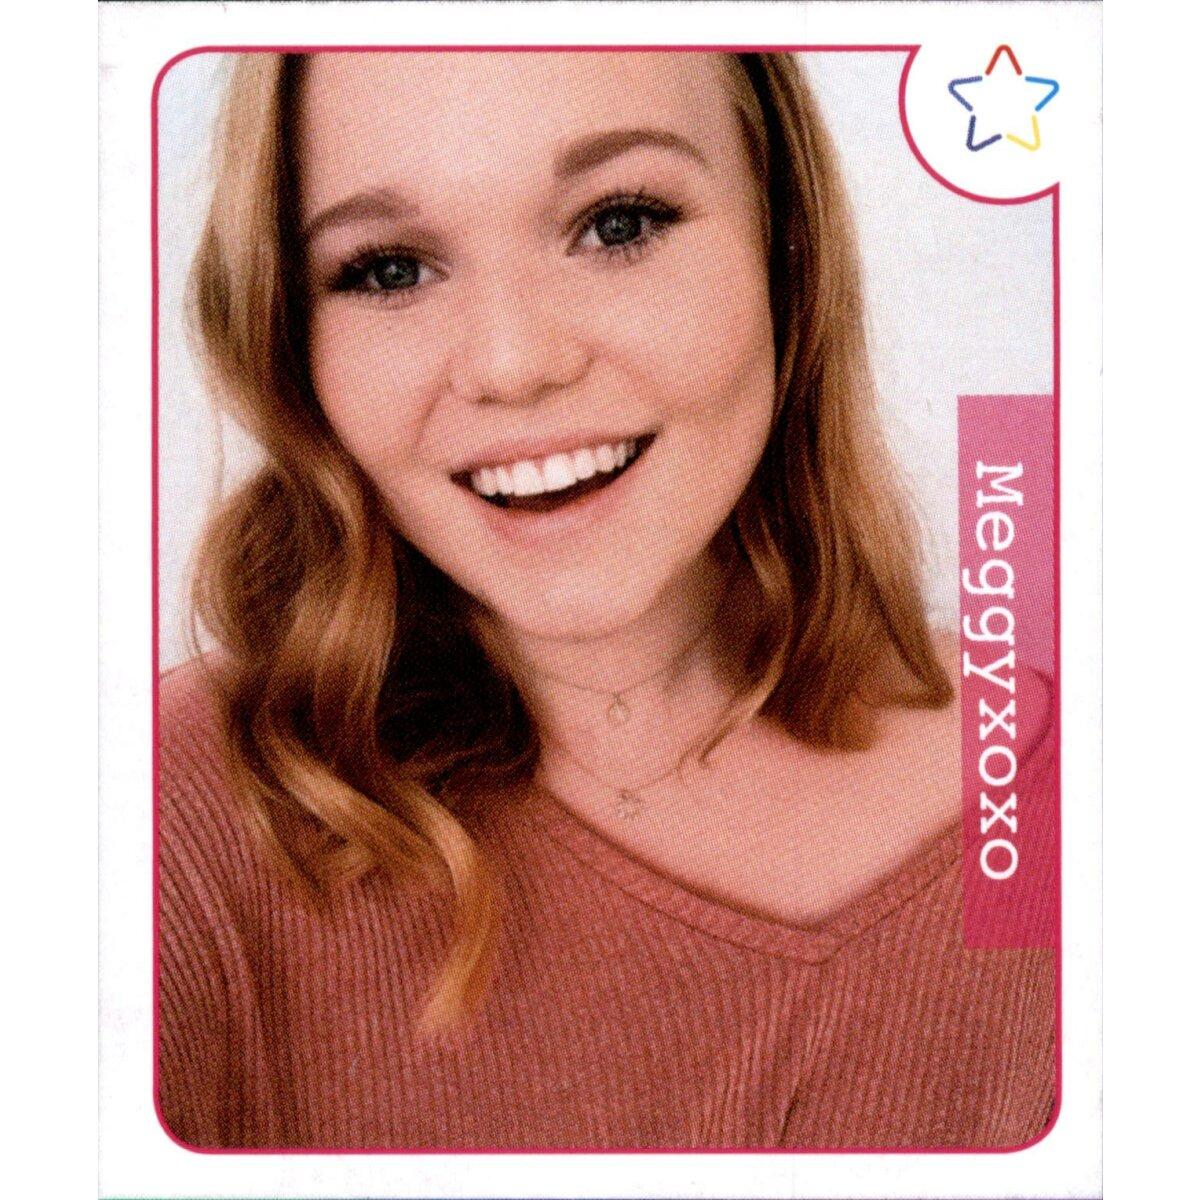 Sticker 182-PANINI-Webstars 2018 Girls-Patrizia Palme